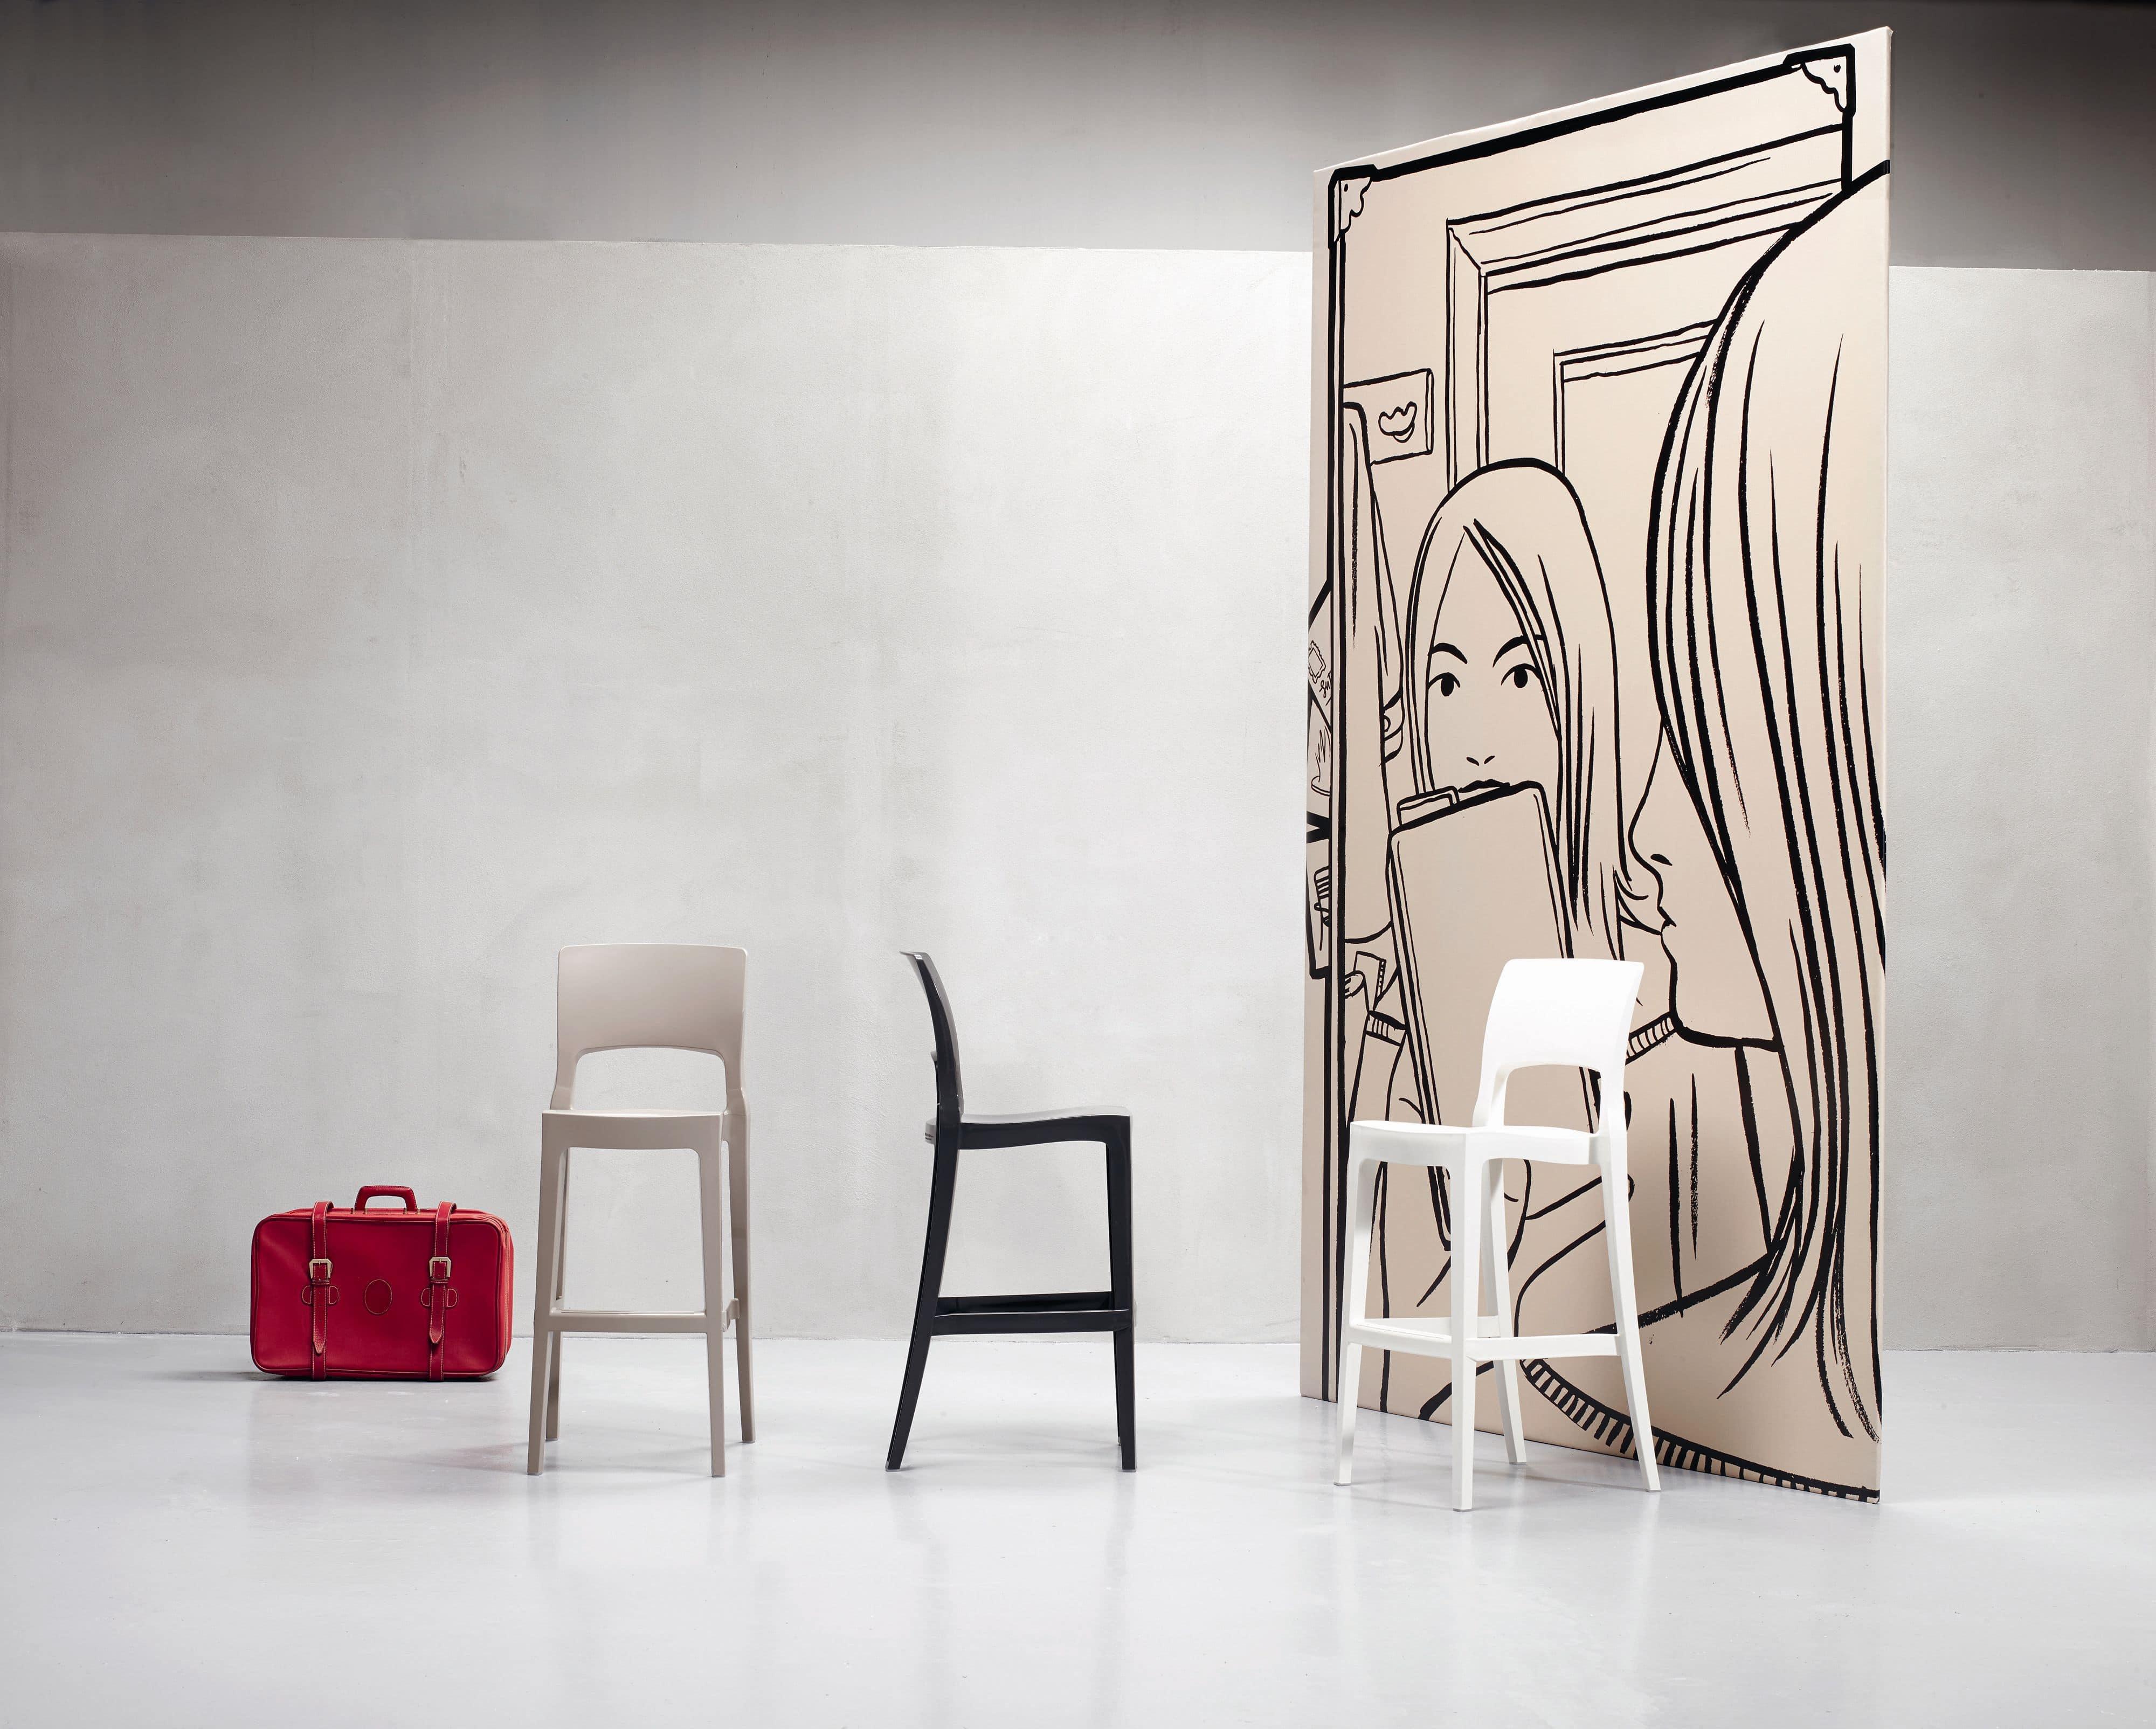 Isy barstool, Modern stool in plastic, for bars or home